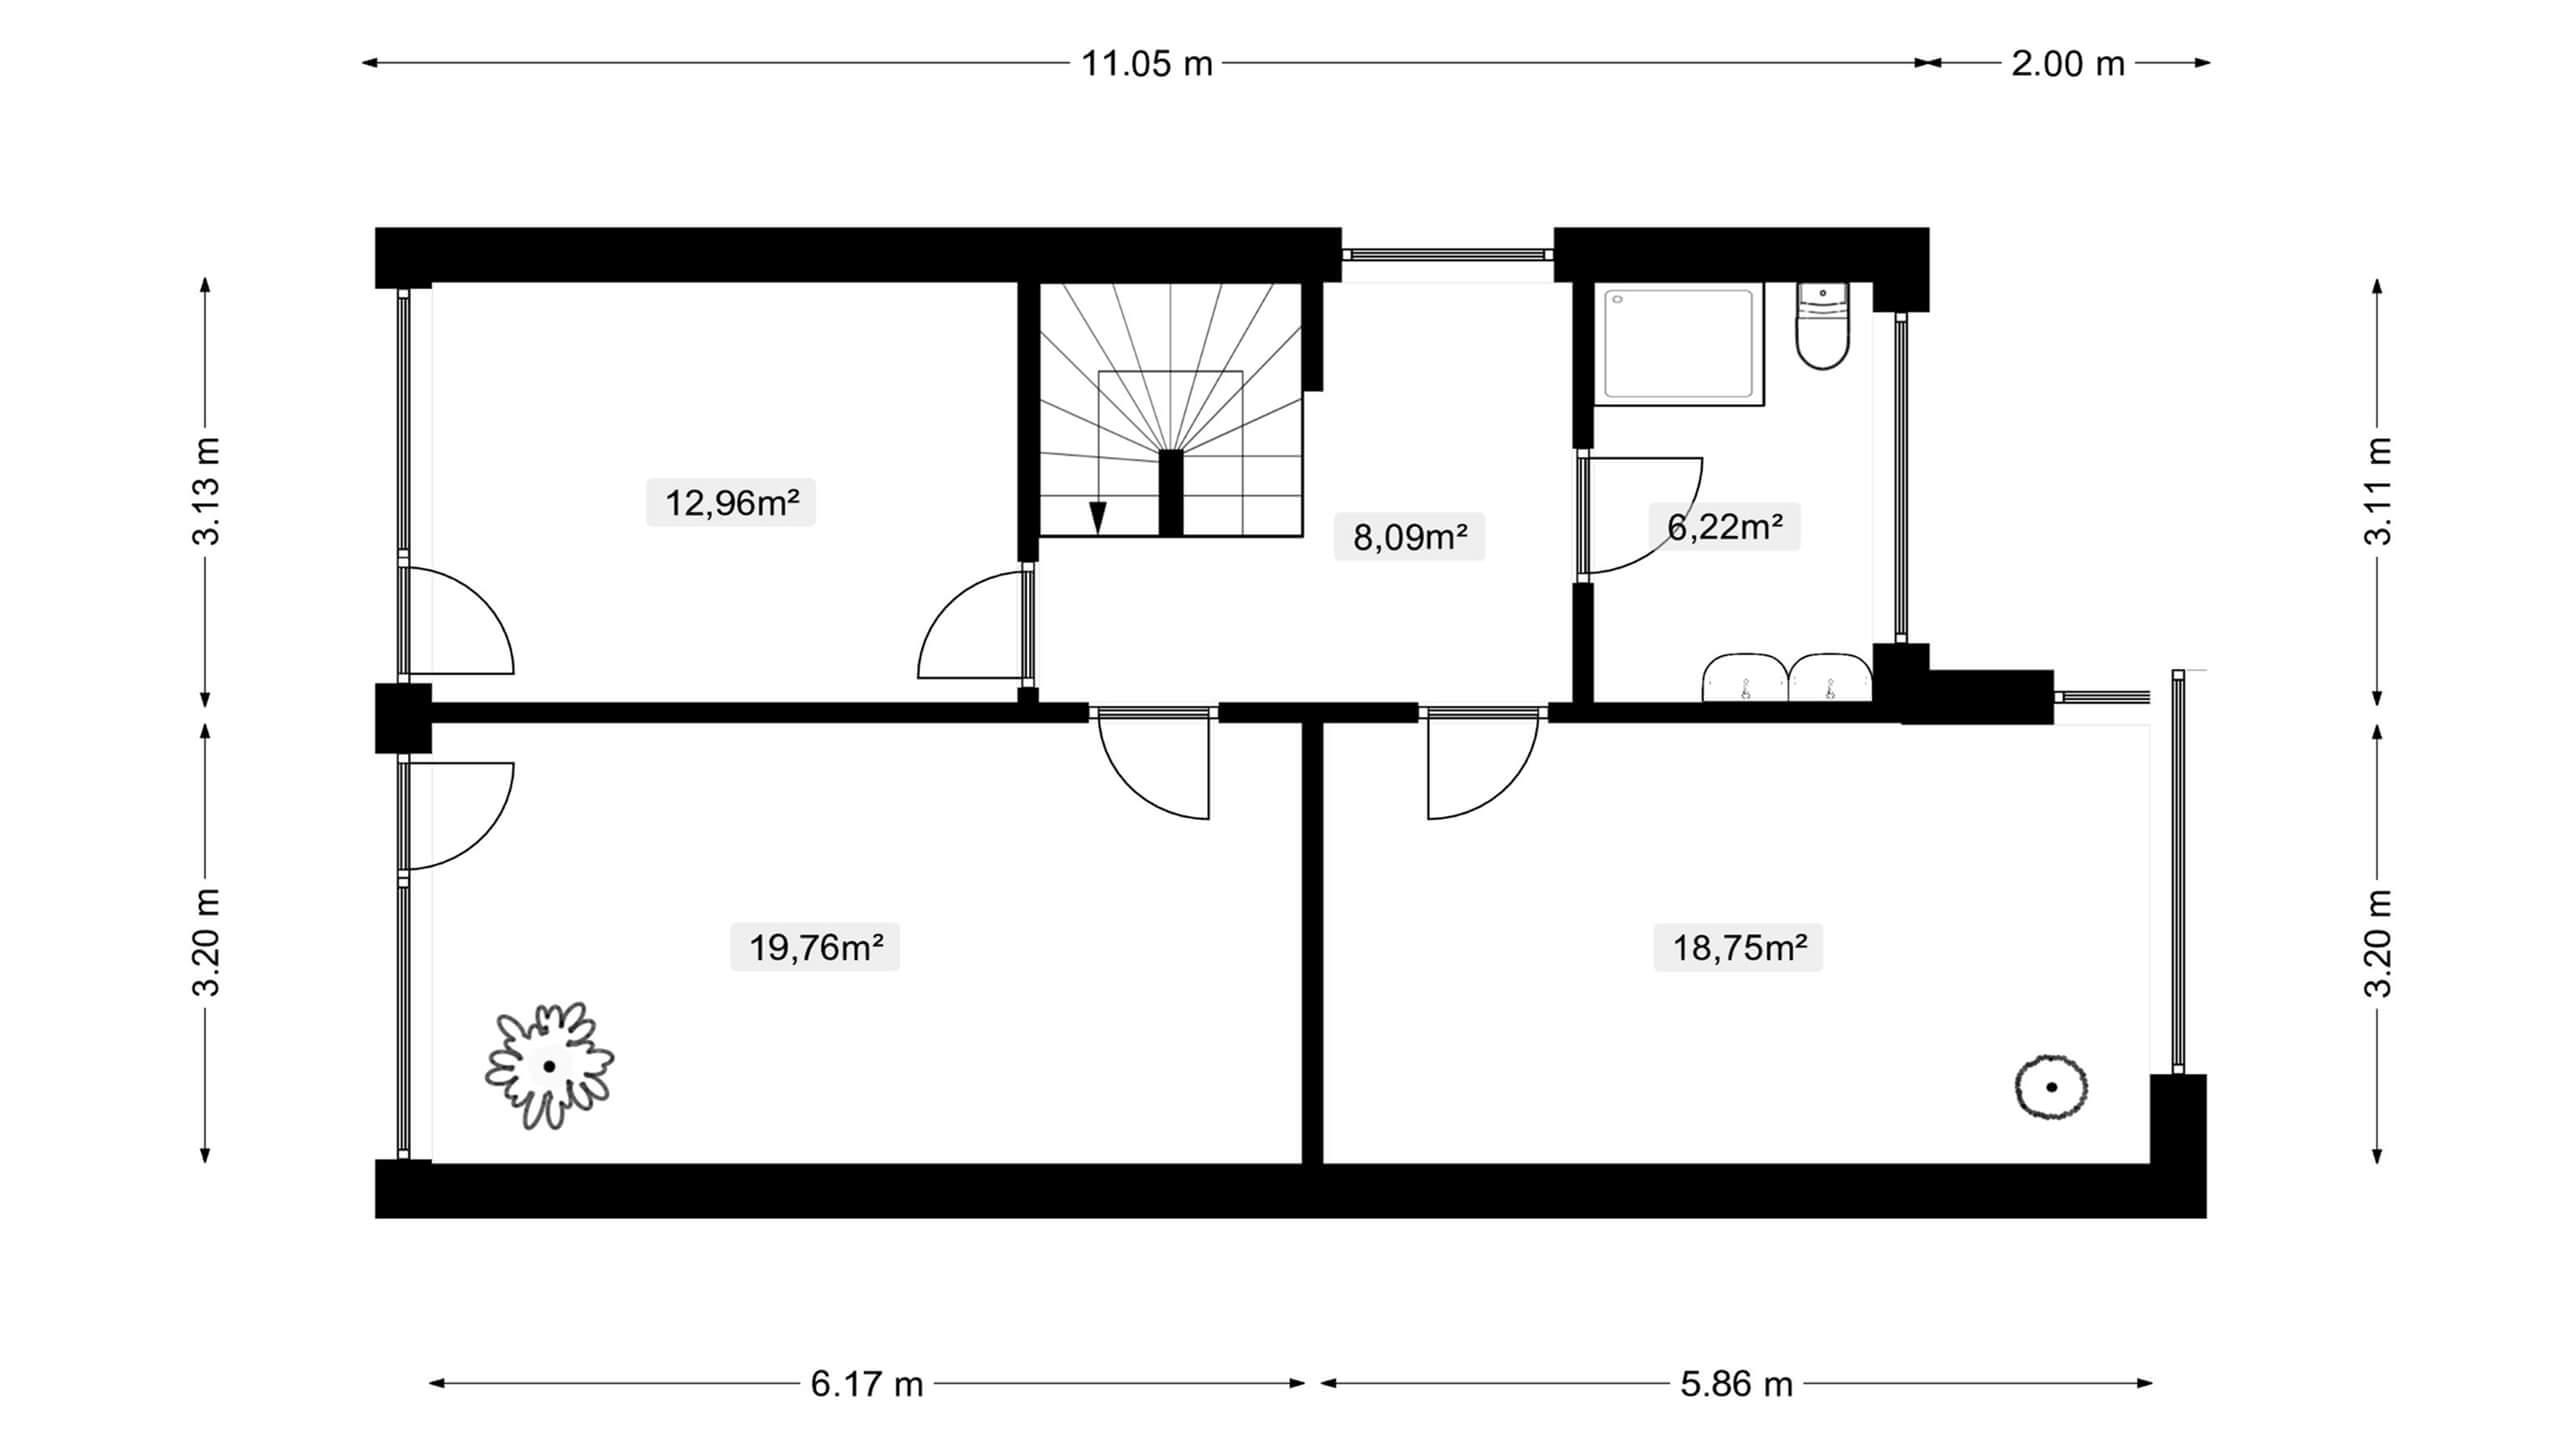 Řadový dům Dům 8